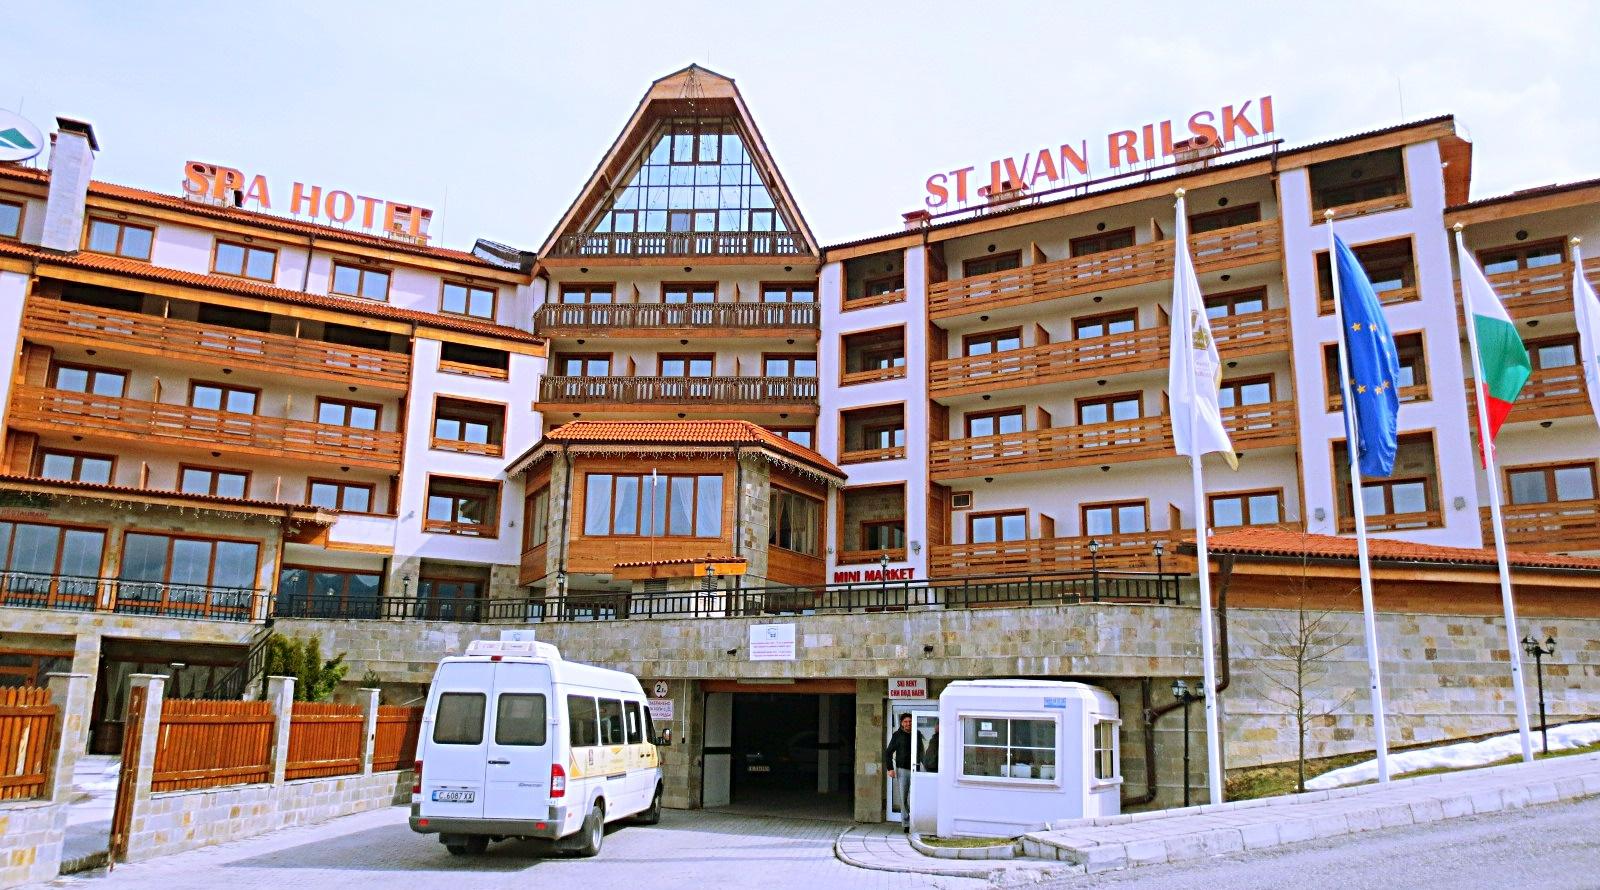 Bansko stivan rilski hotel spa furnished studio stivan rilski hotel publicscrutiny Gallery